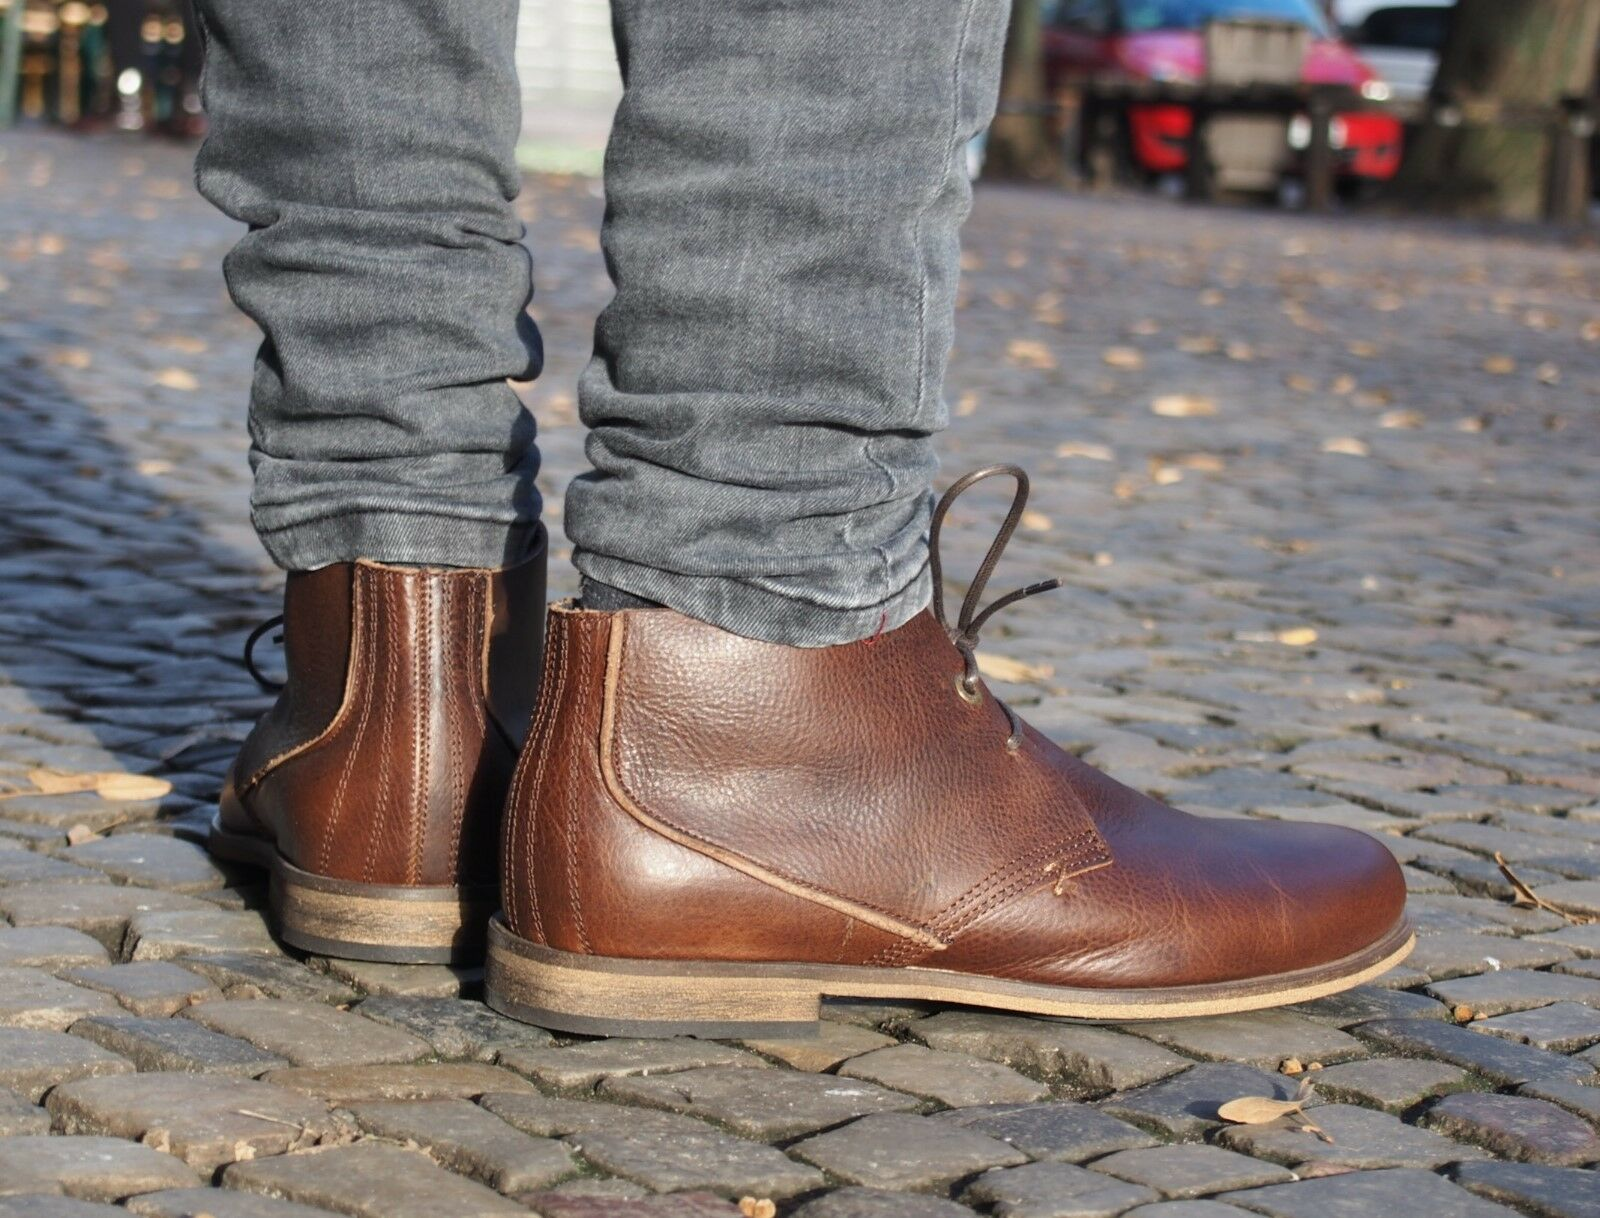 HUB dk Footwear Herrenschuhe SPURS L dk HUB brown braun Stiefelette Echtleder NEU SALE ae0a57